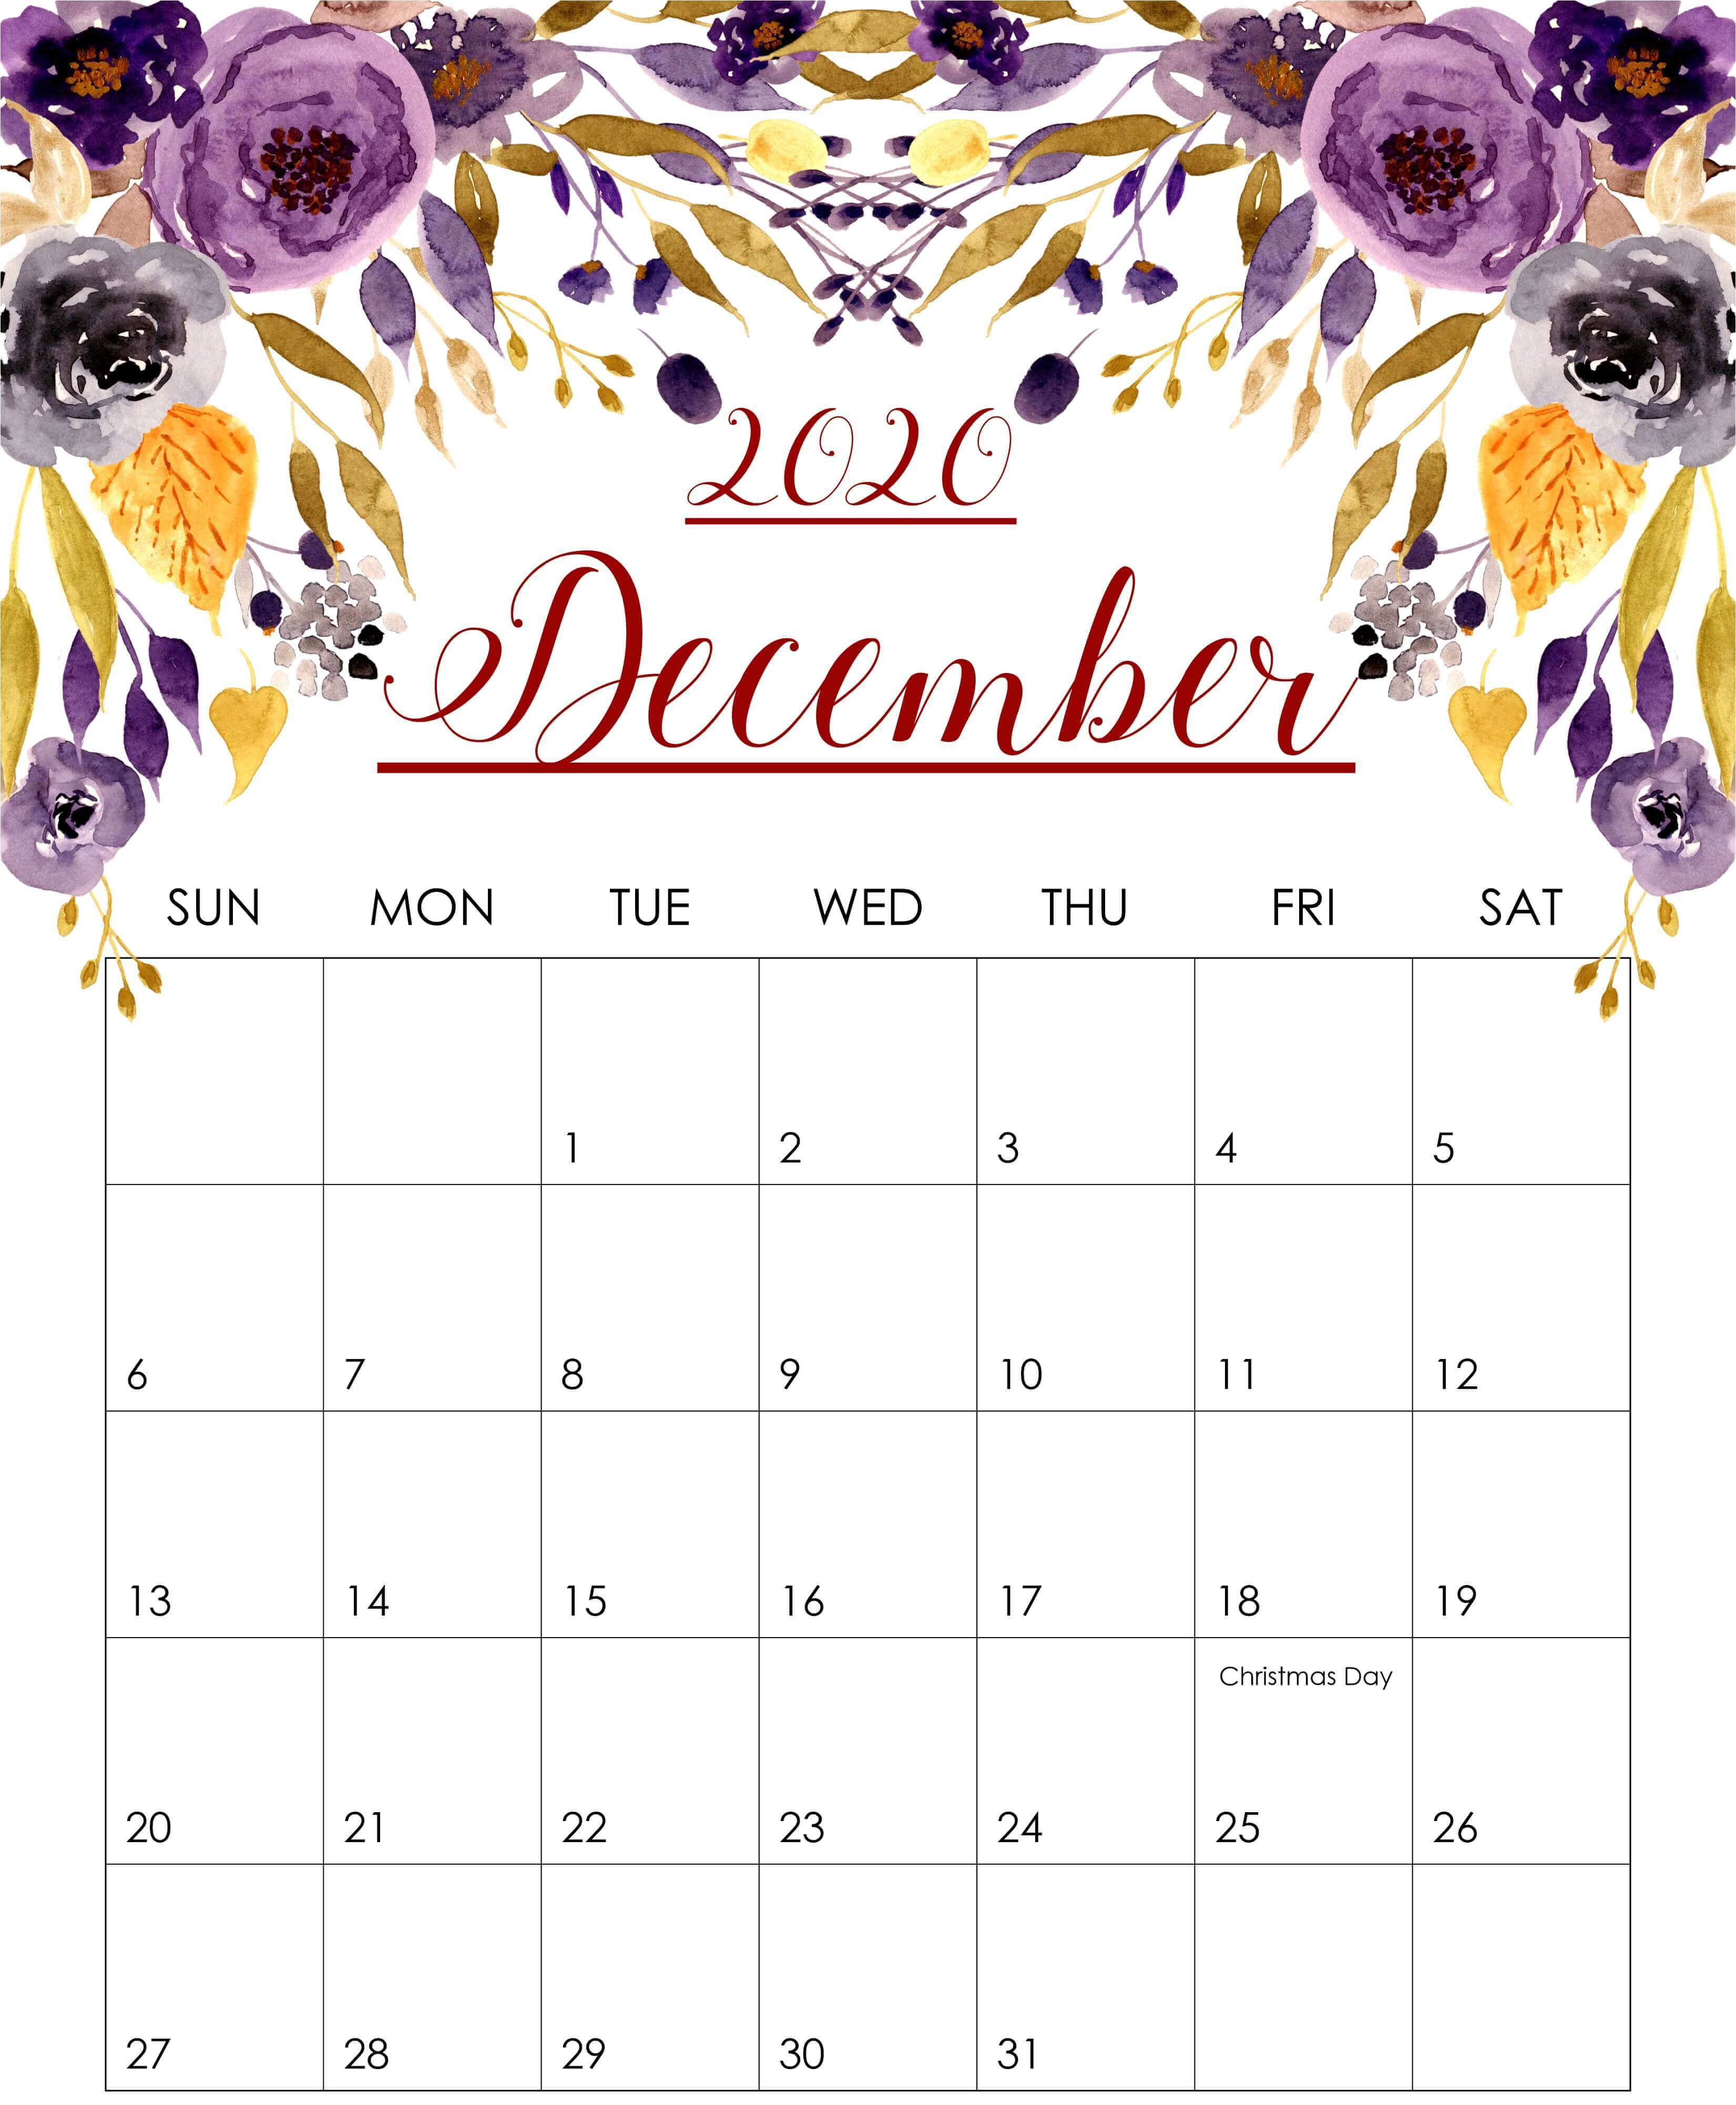 2020 December Floral Calendar